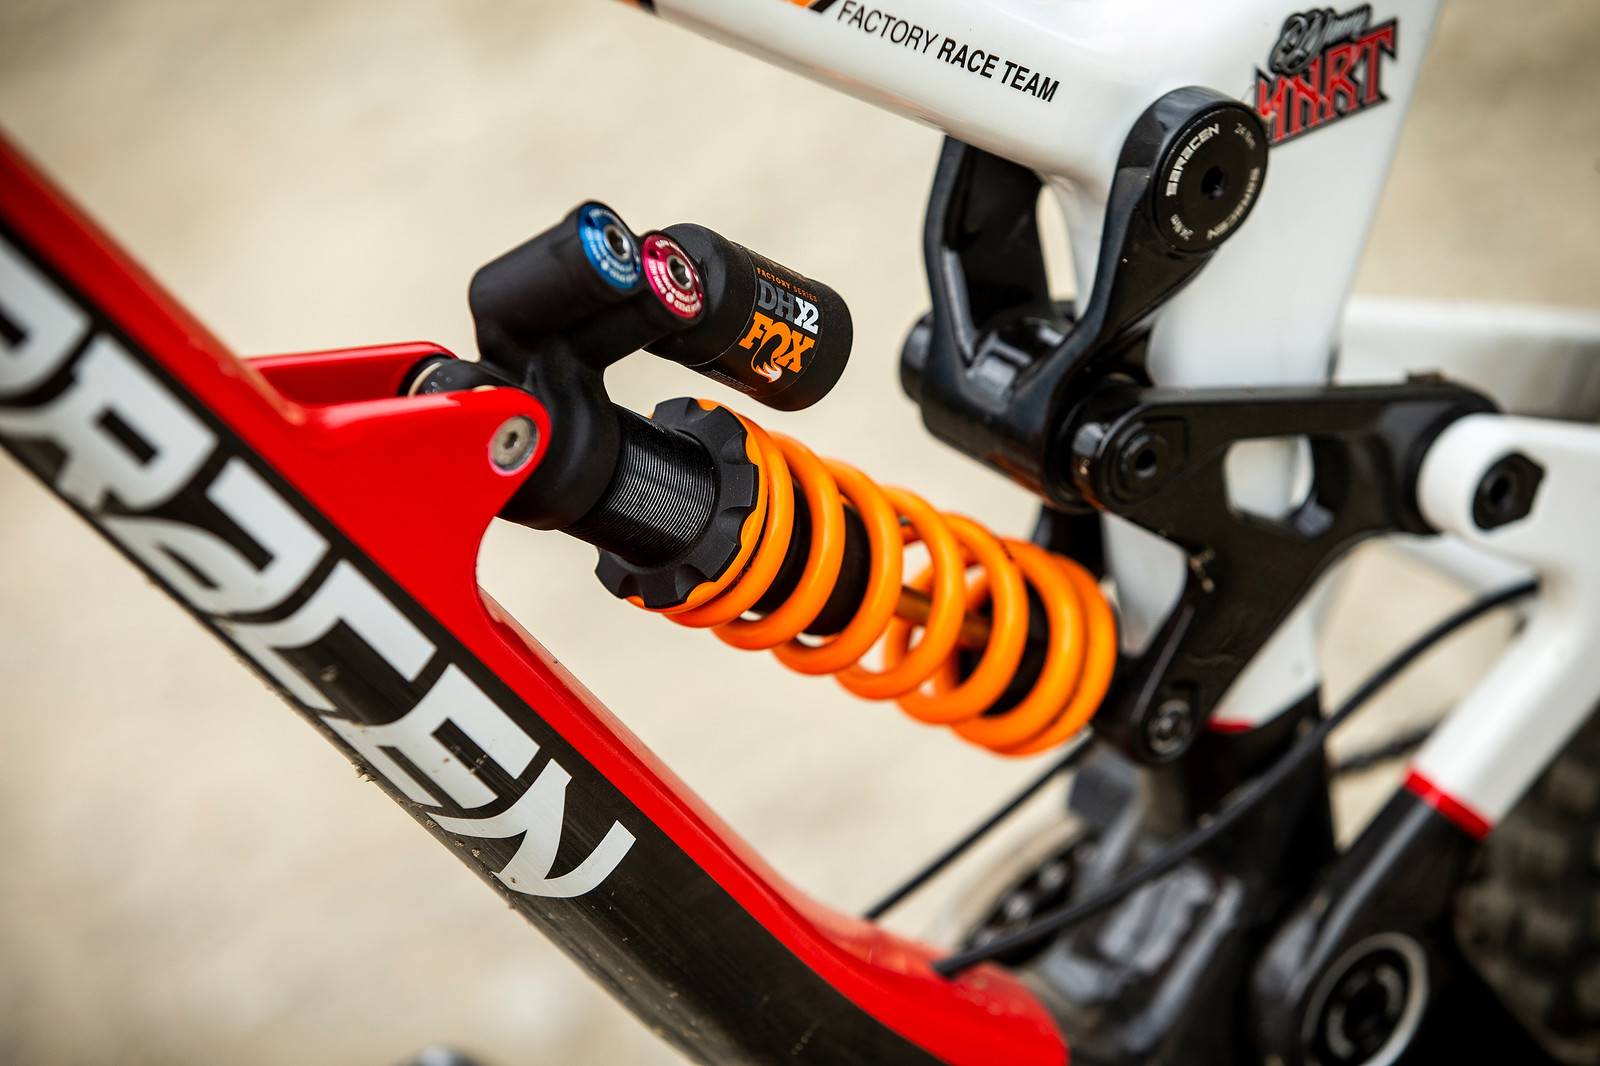 FOX DHX2 Coil Shock - WINNING BIKE - Danny Hart's Saracen Myst - Mountain Biking Pictures - Vital MTB